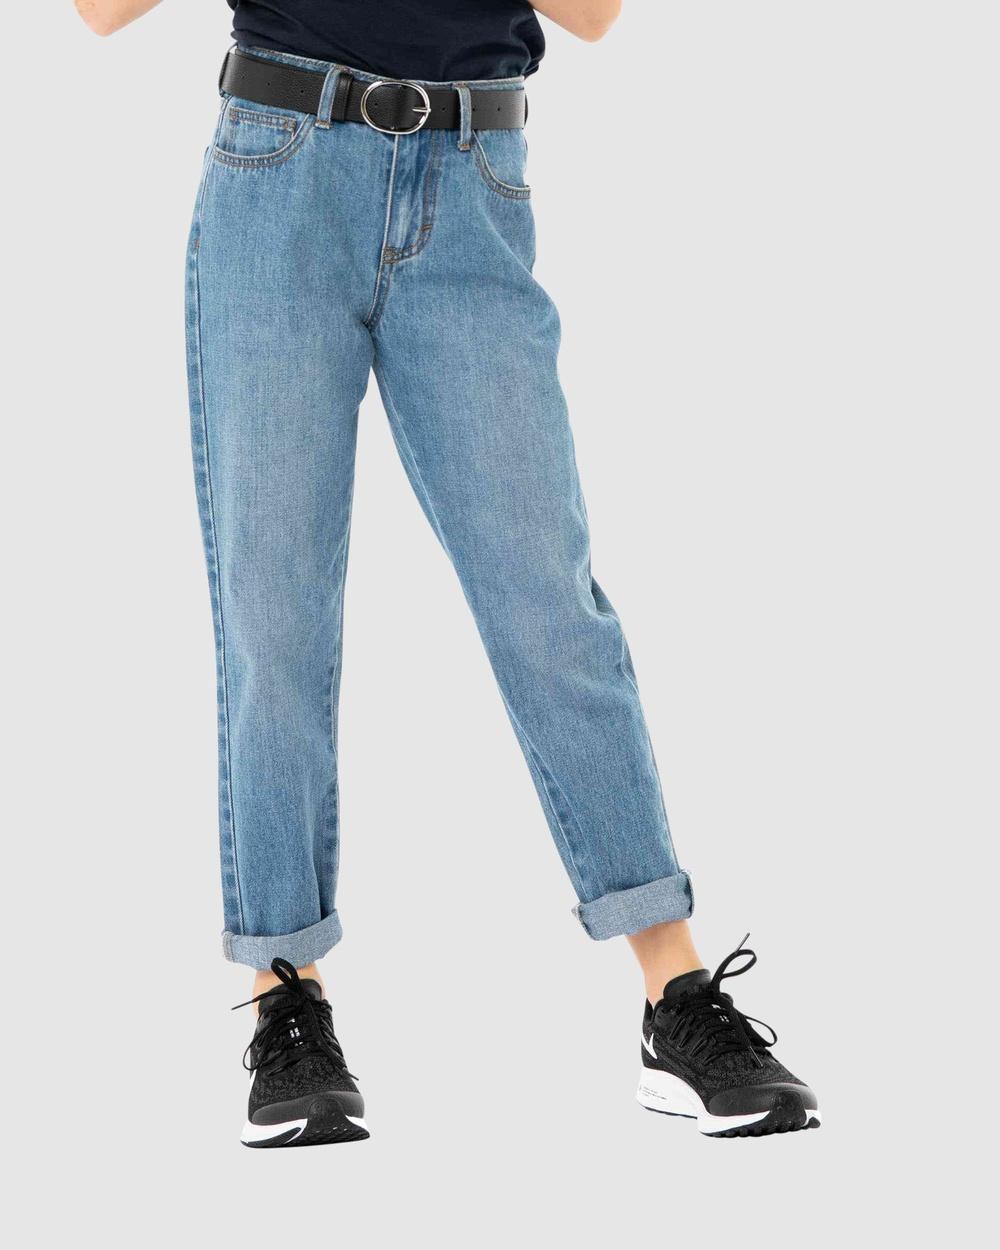 Rusty High Rise Straight Jean Girls Jeans THD Australia